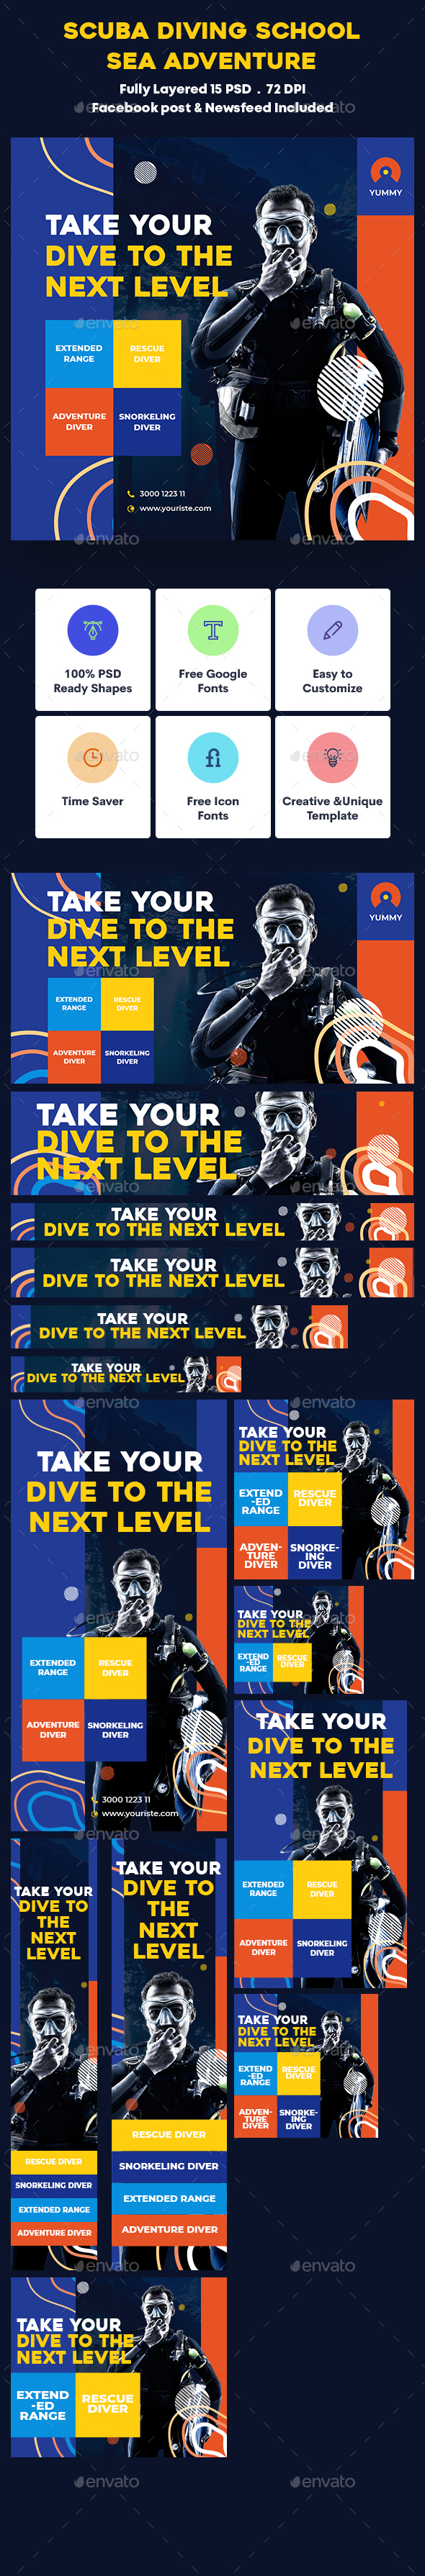 Scuba Diving School, Sea Adventure Banners Ad